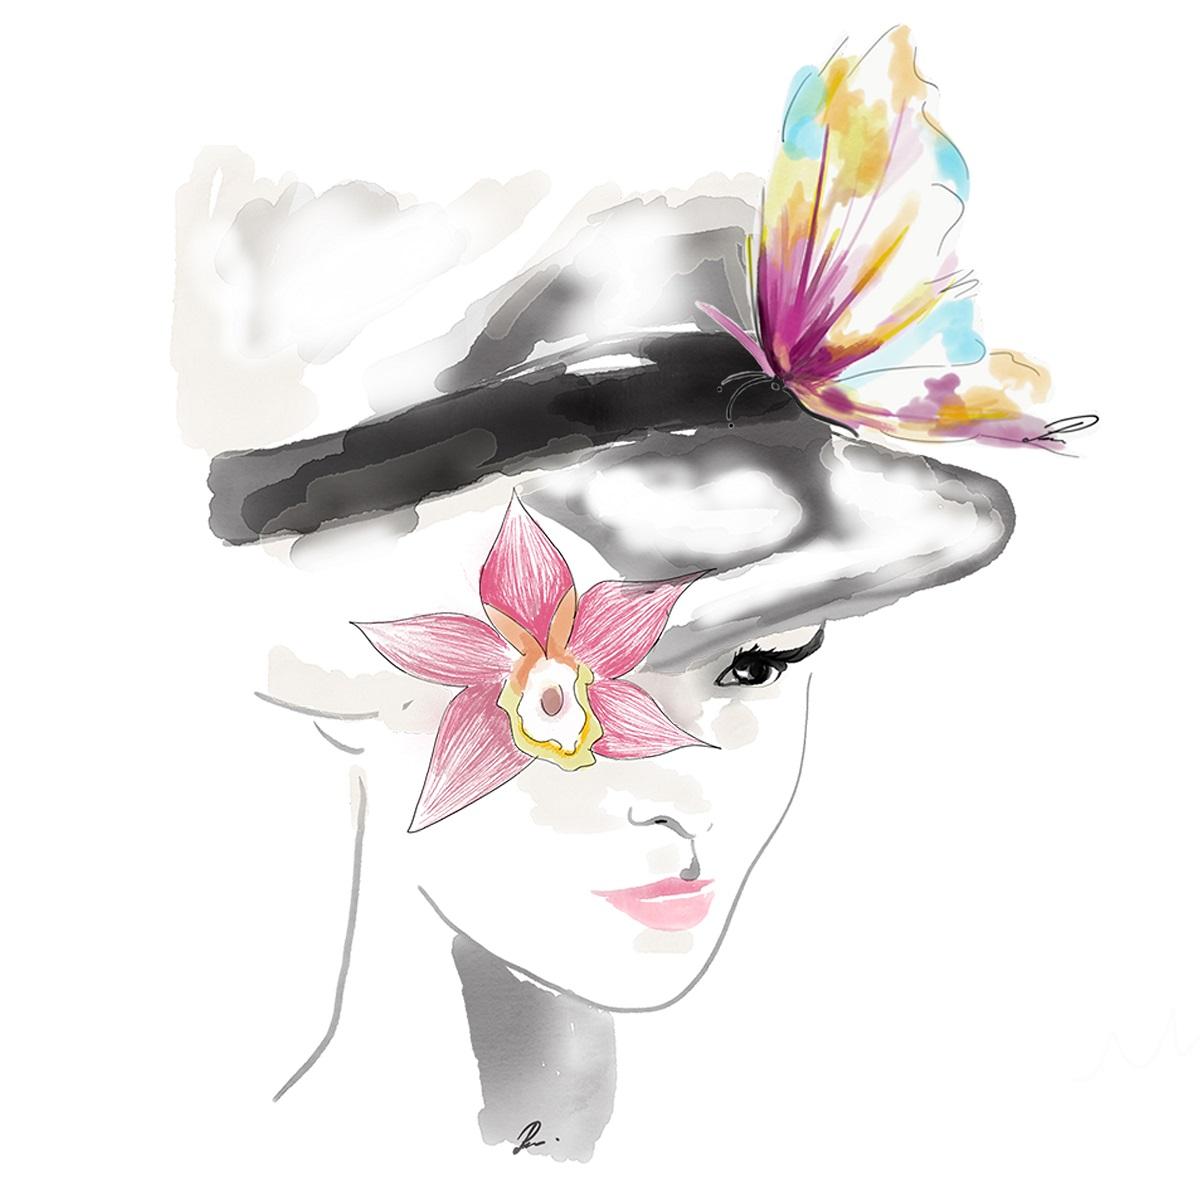 Dusita Fleur de Lalita   Duftbeschreibung und Bewertung